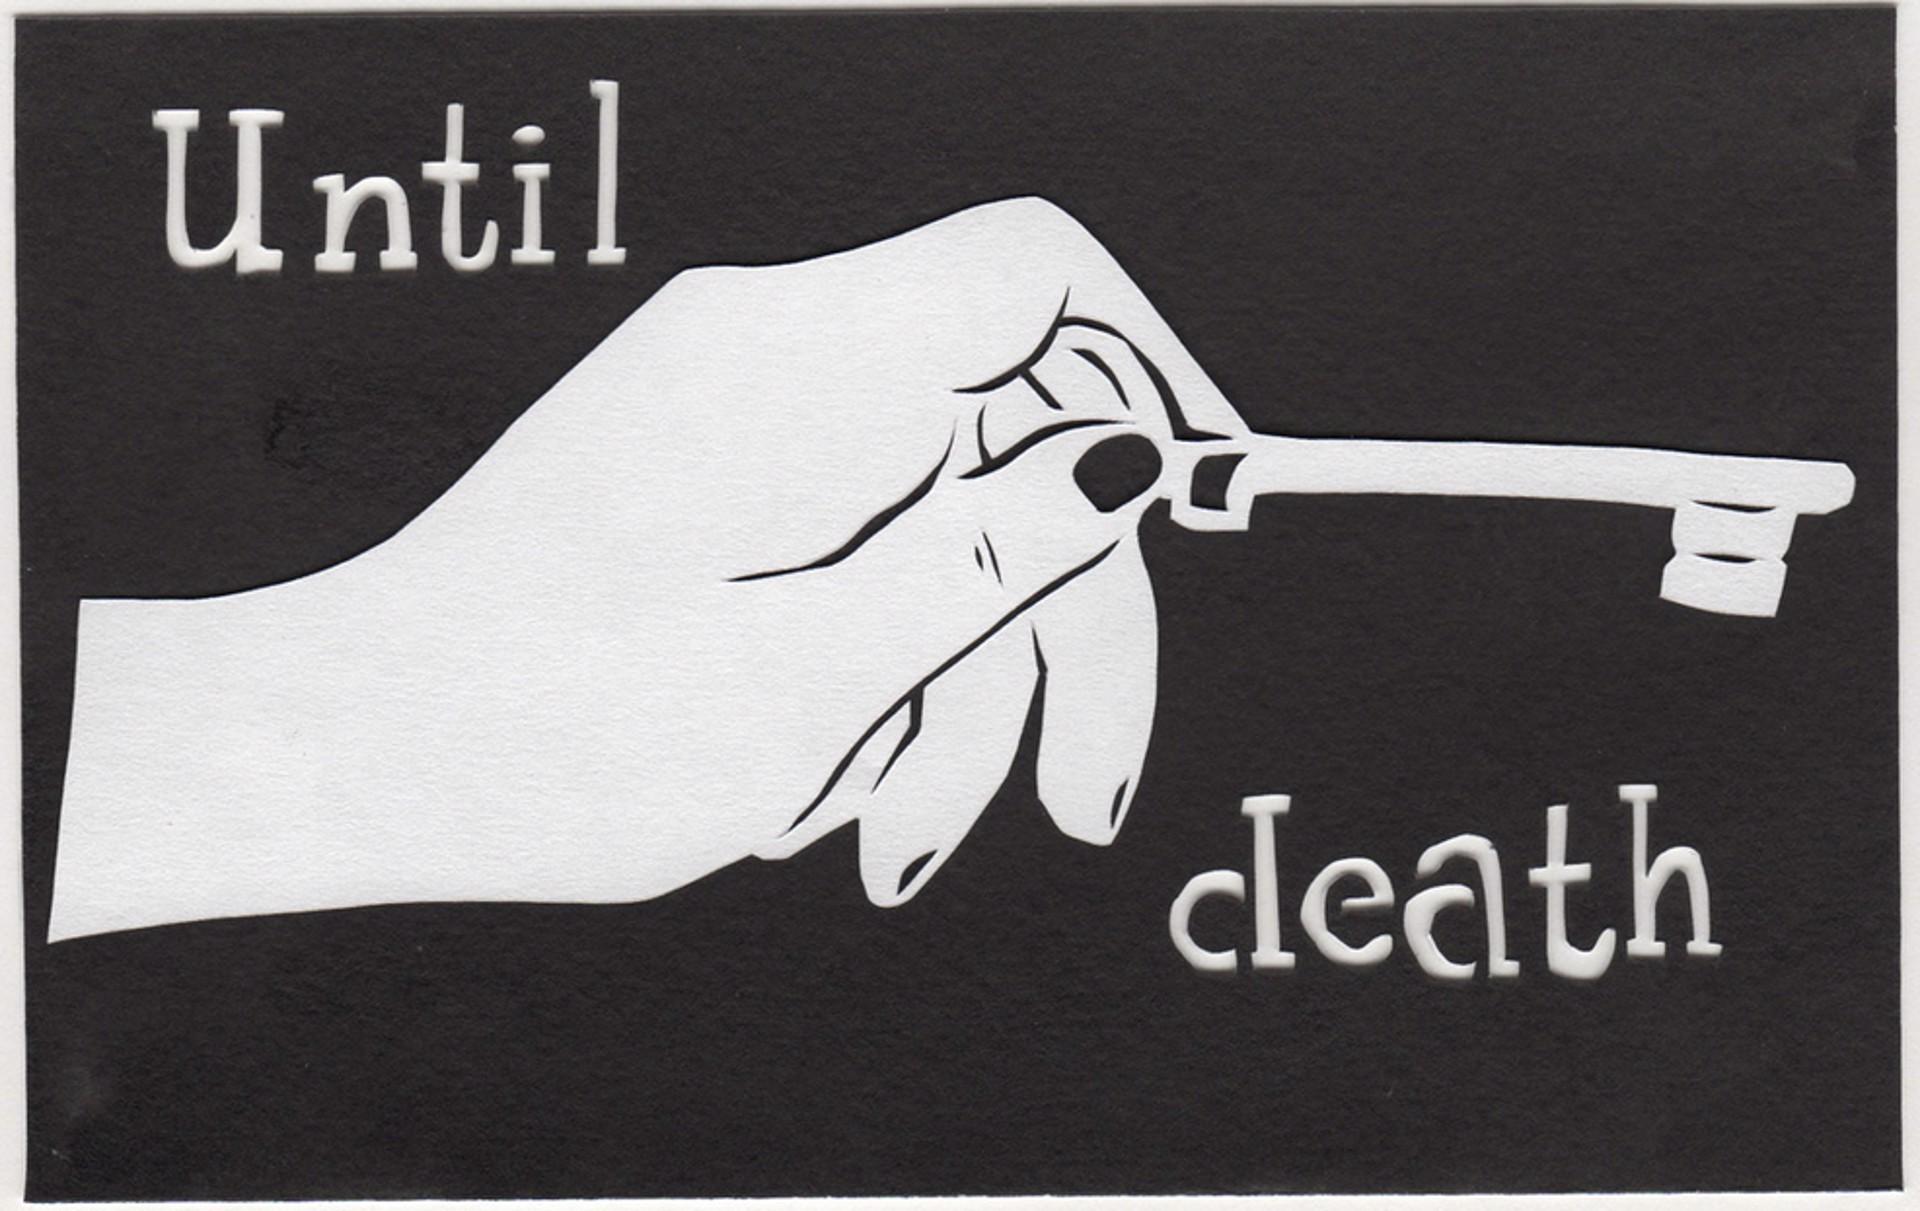 Until Death by Lauren Iida | Early Works